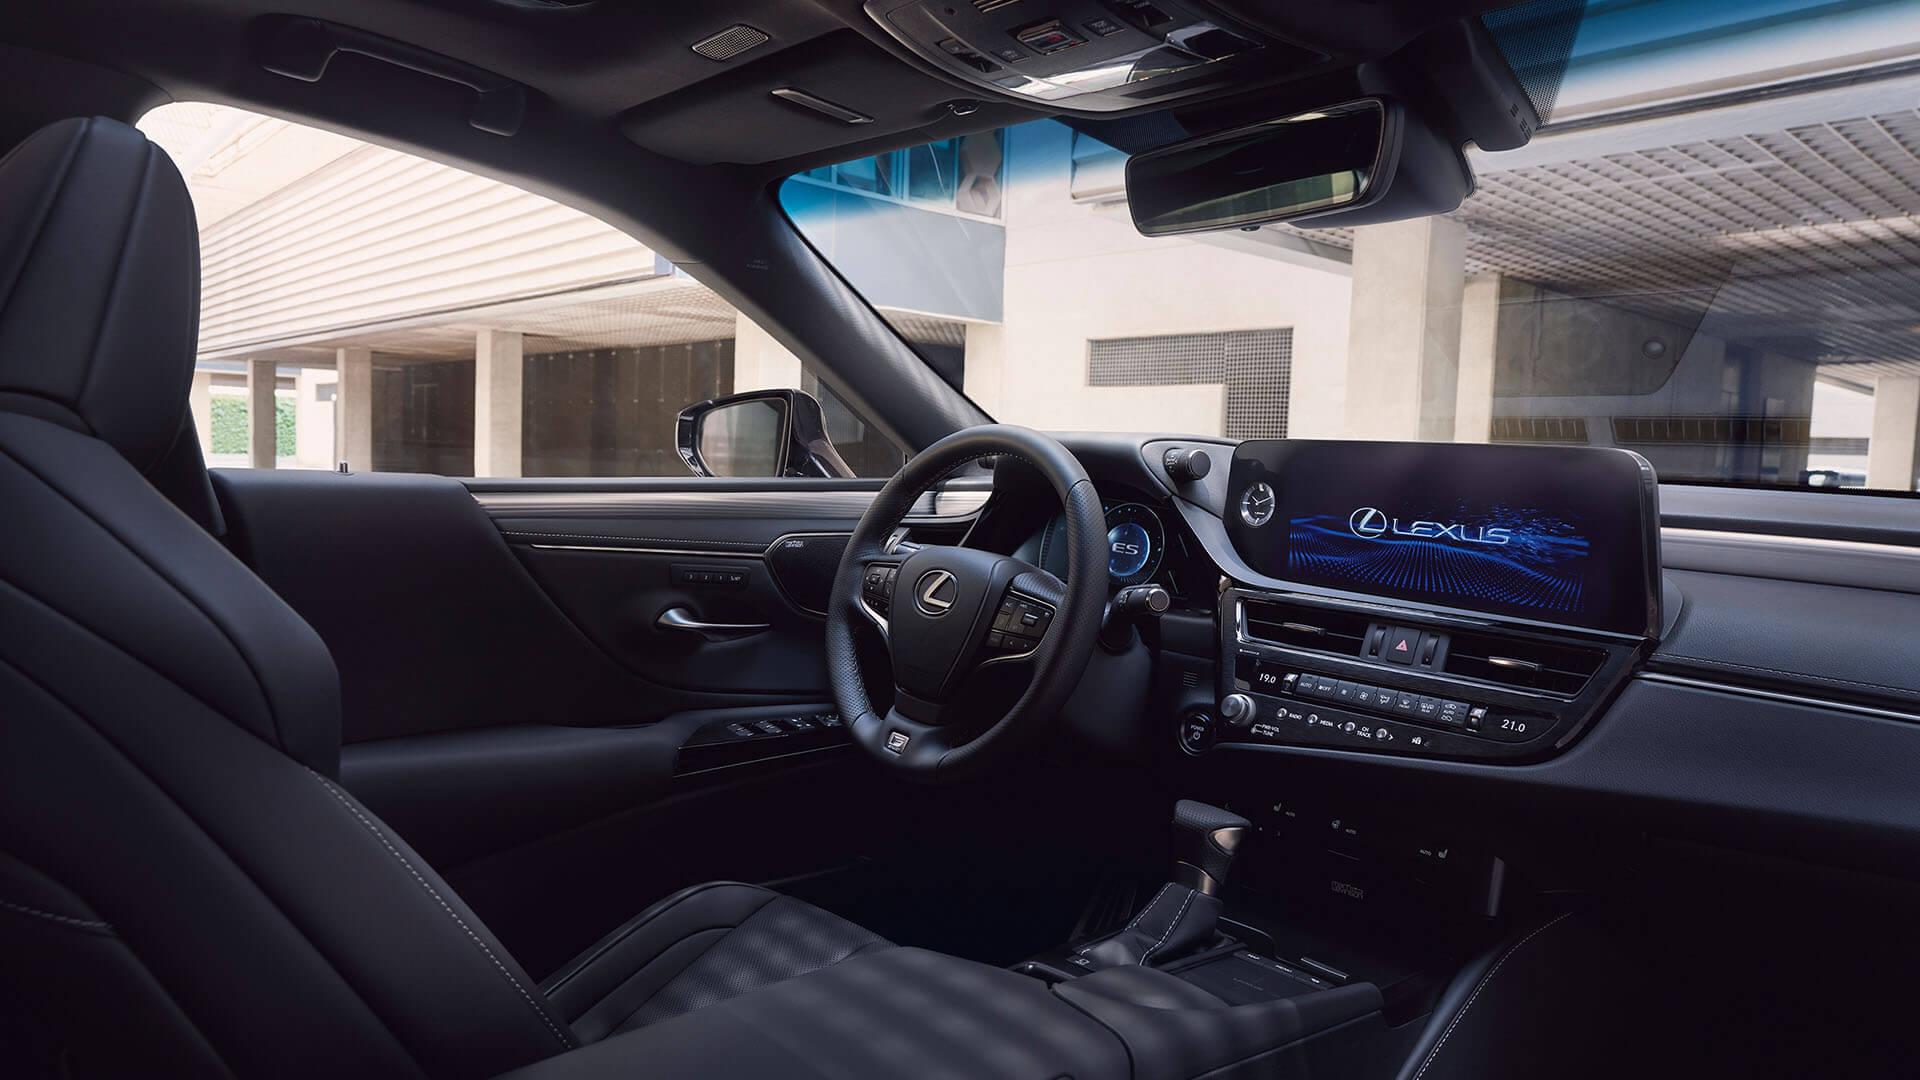 2022 lexus es experience interior back sounds insulation